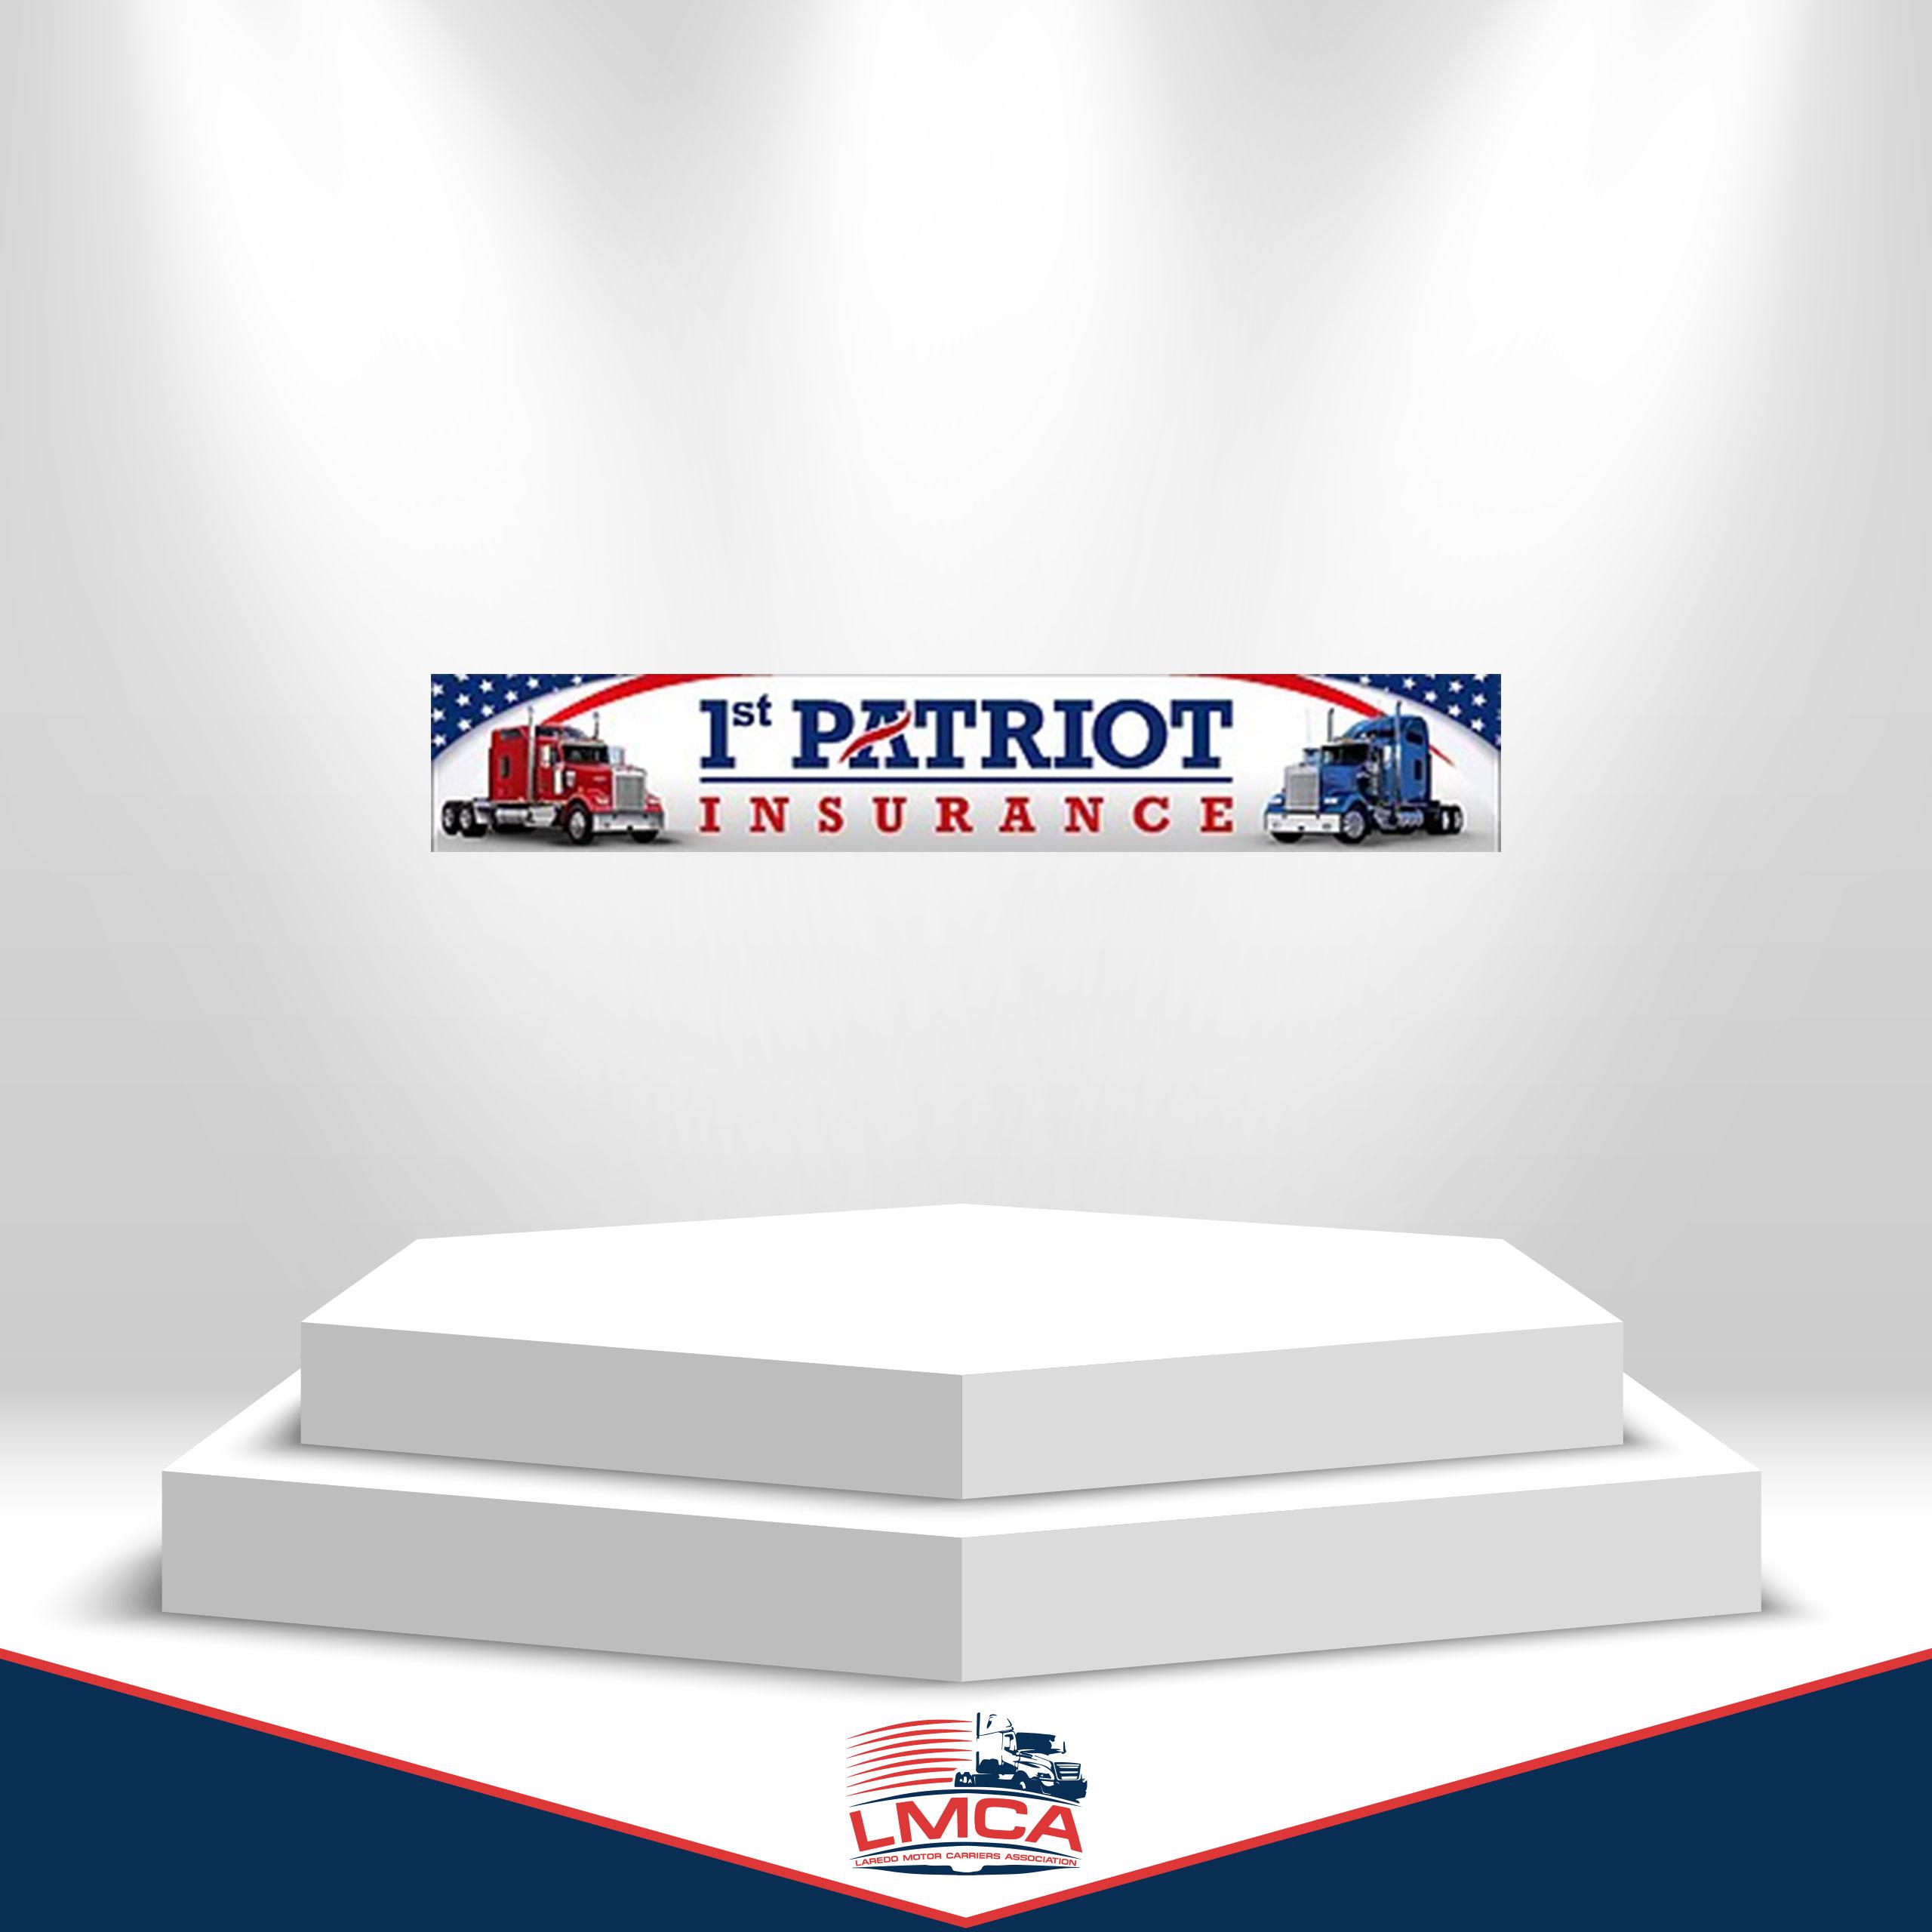 1st patriot insurance